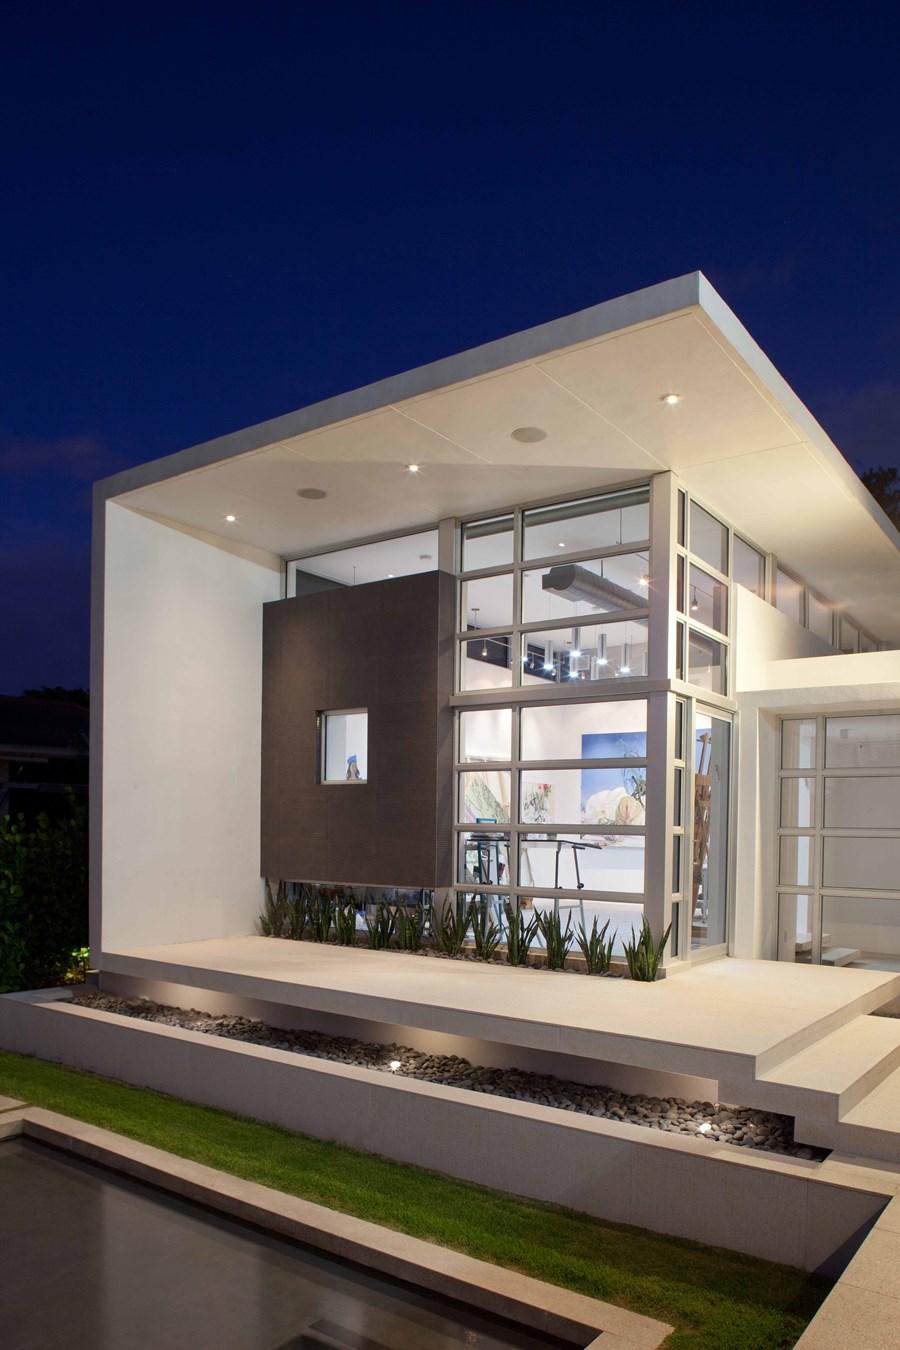 Lakewood Art Studio by KZ Architecture 24